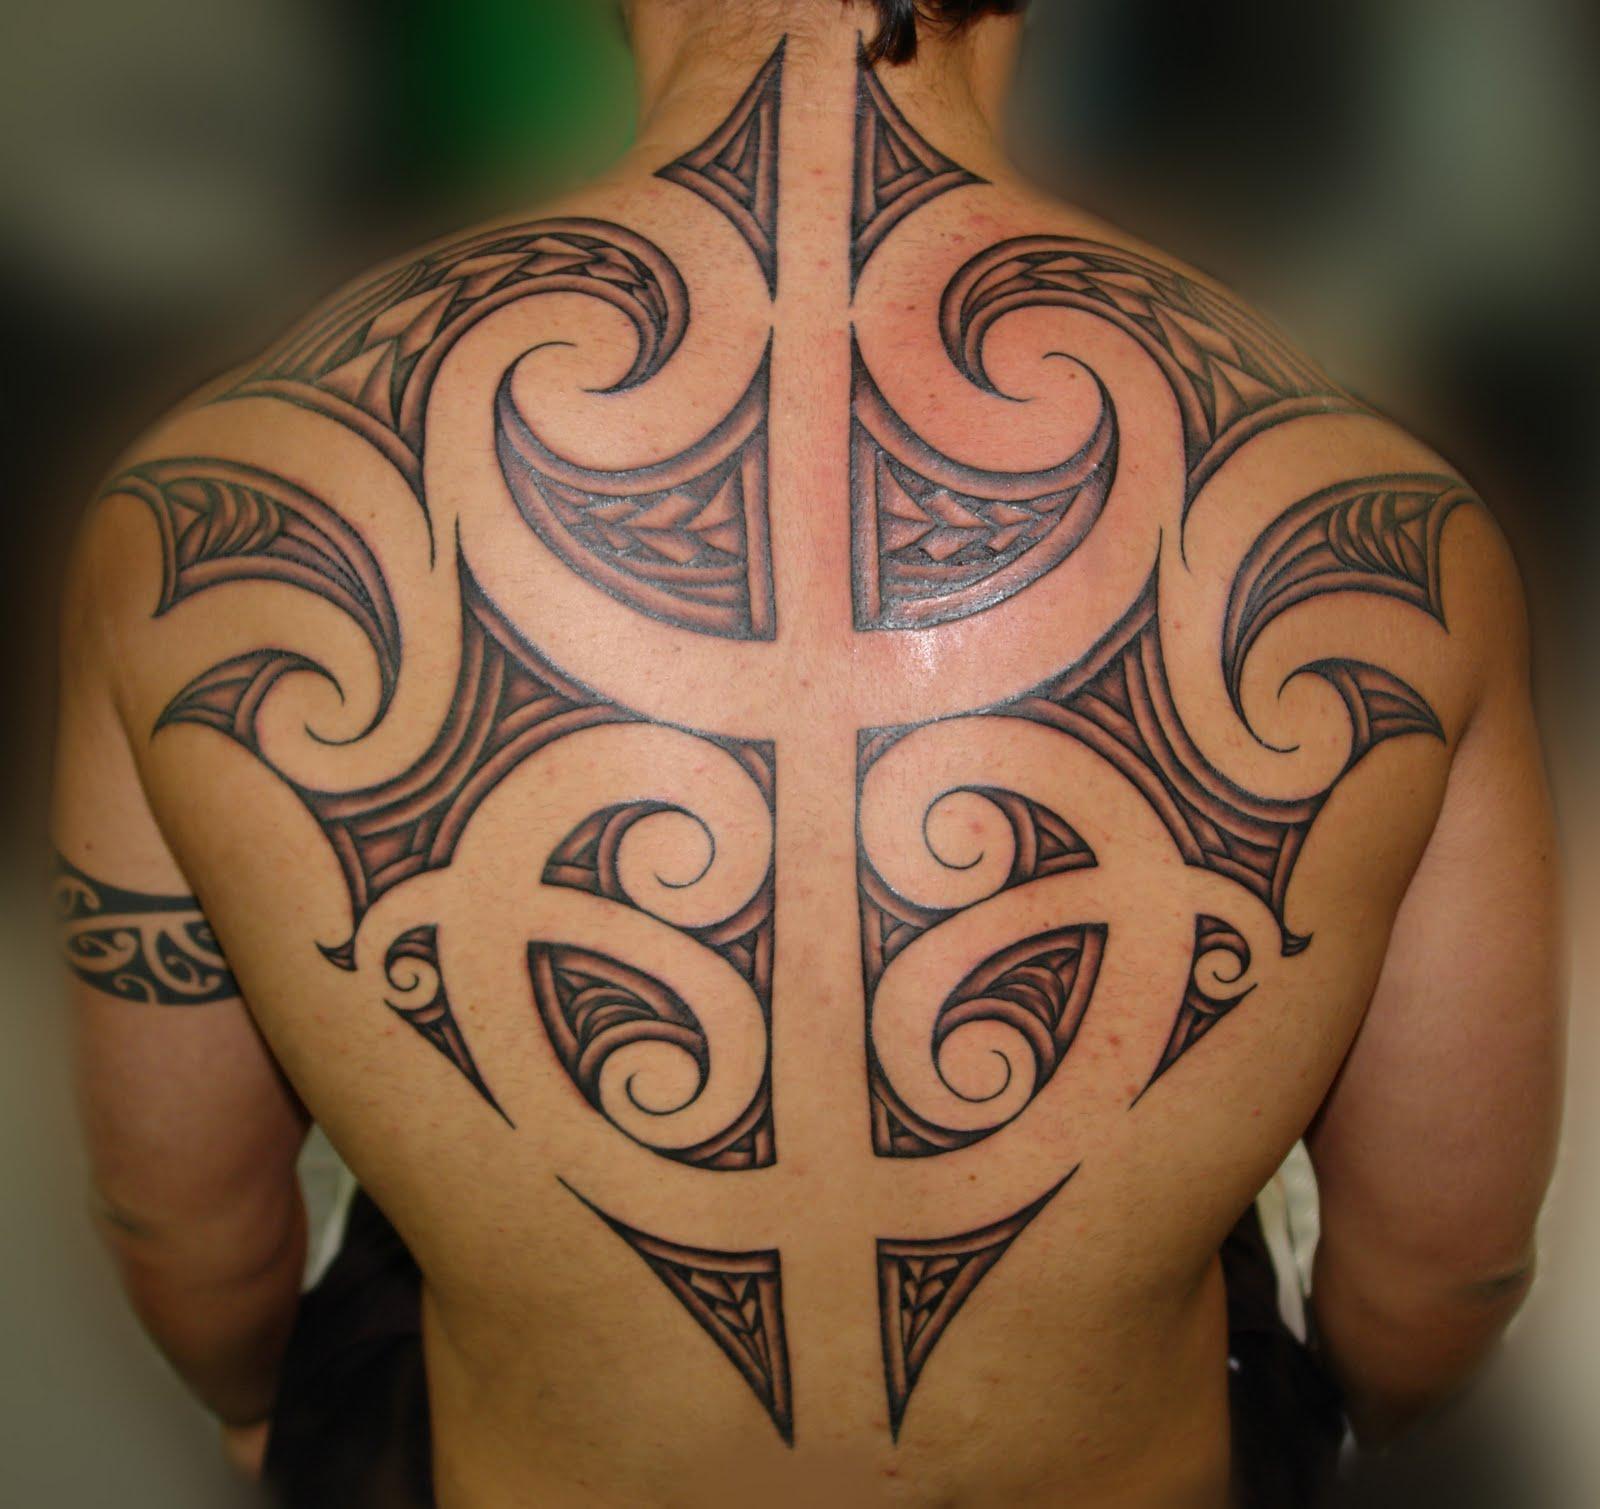 maori tattoos ytribaltattoos.blo.com maori tattoo for back